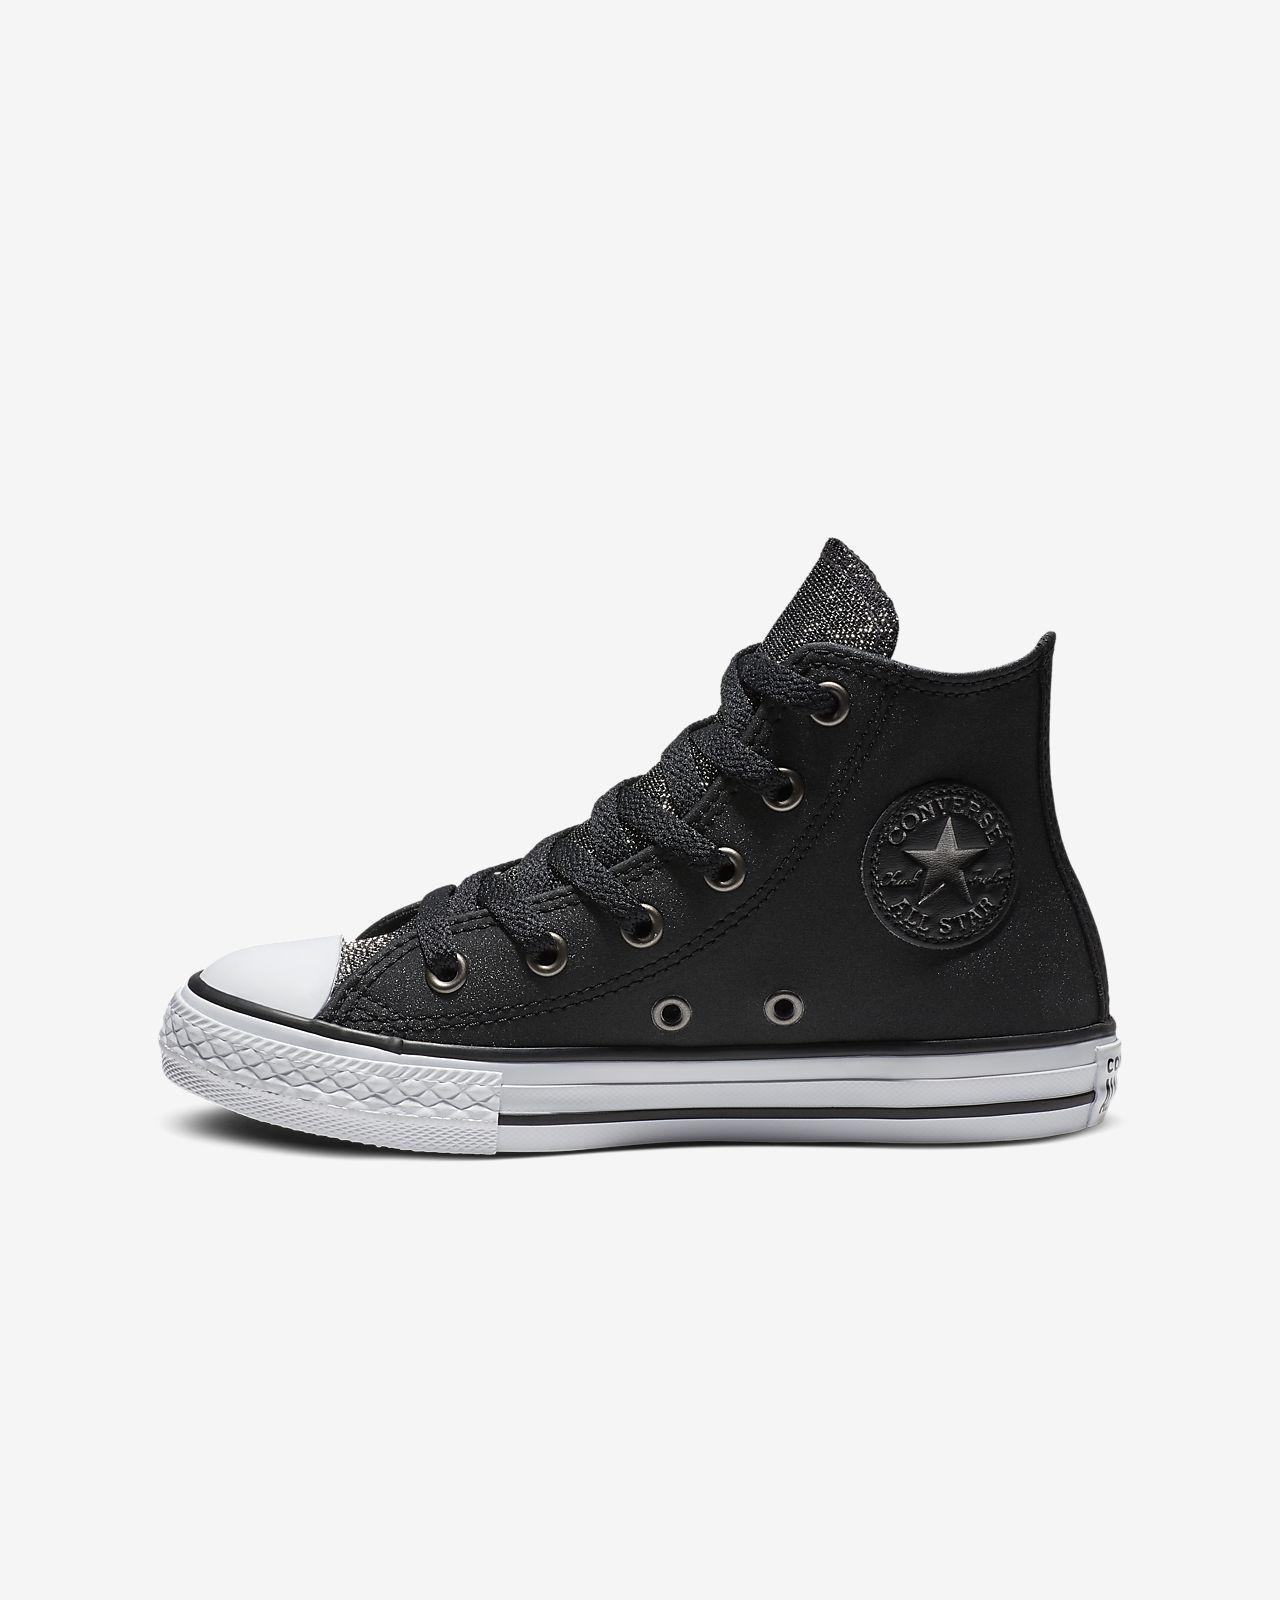 Converse Chuck Taylor All Star Graphite Glitter Leather High Top Big Kids   Shoe 4c862bca6e